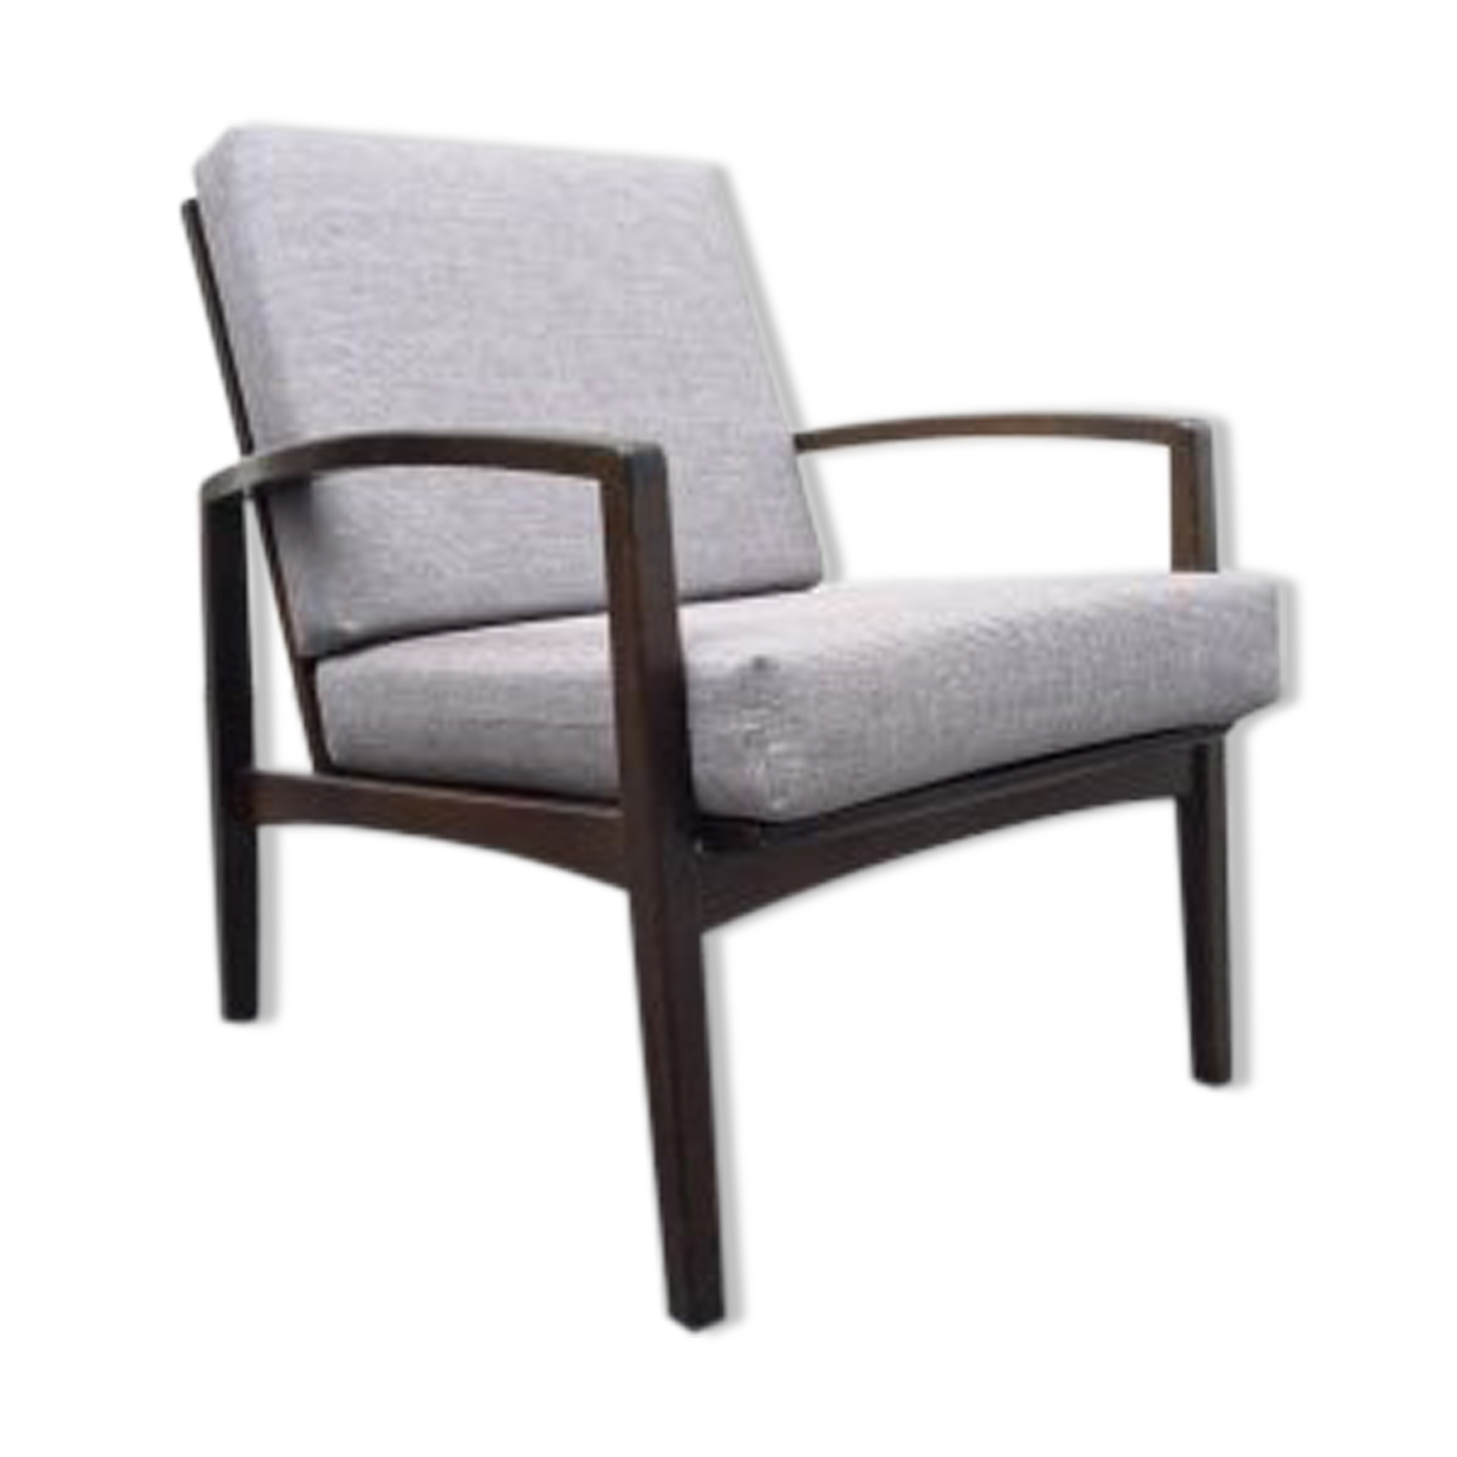 free le bon coin78 with le bon coin78. Black Bedroom Furniture Sets. Home Design Ideas